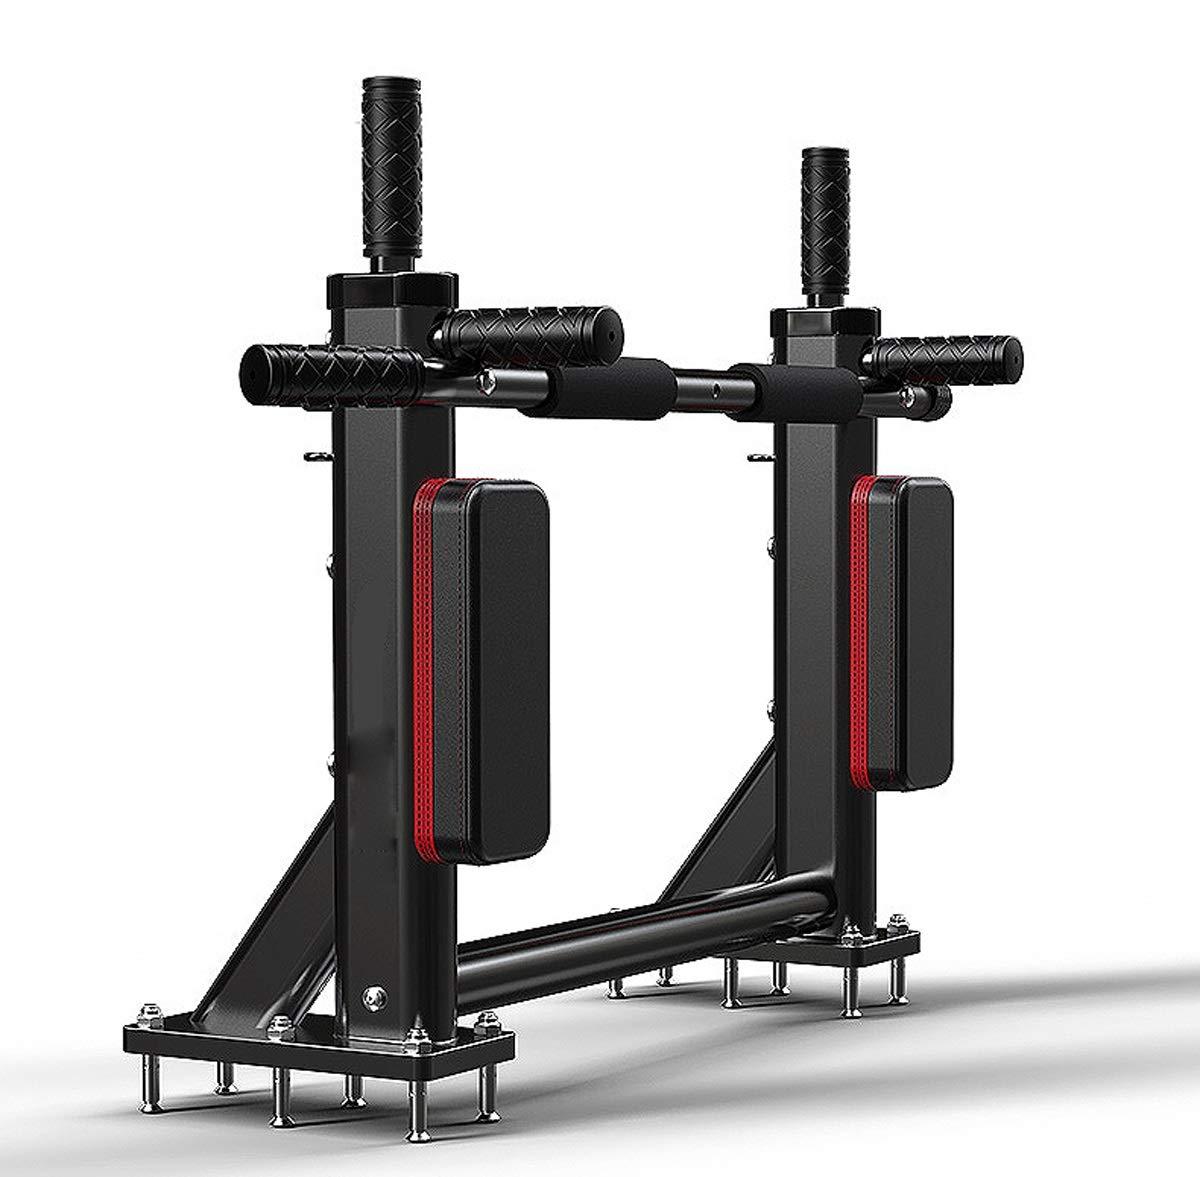 Pull-ups, Horizontal Bar, Indoor Wall, Parallel Bars, Wall Sandbags, Shelf, Home Fitness Equipment